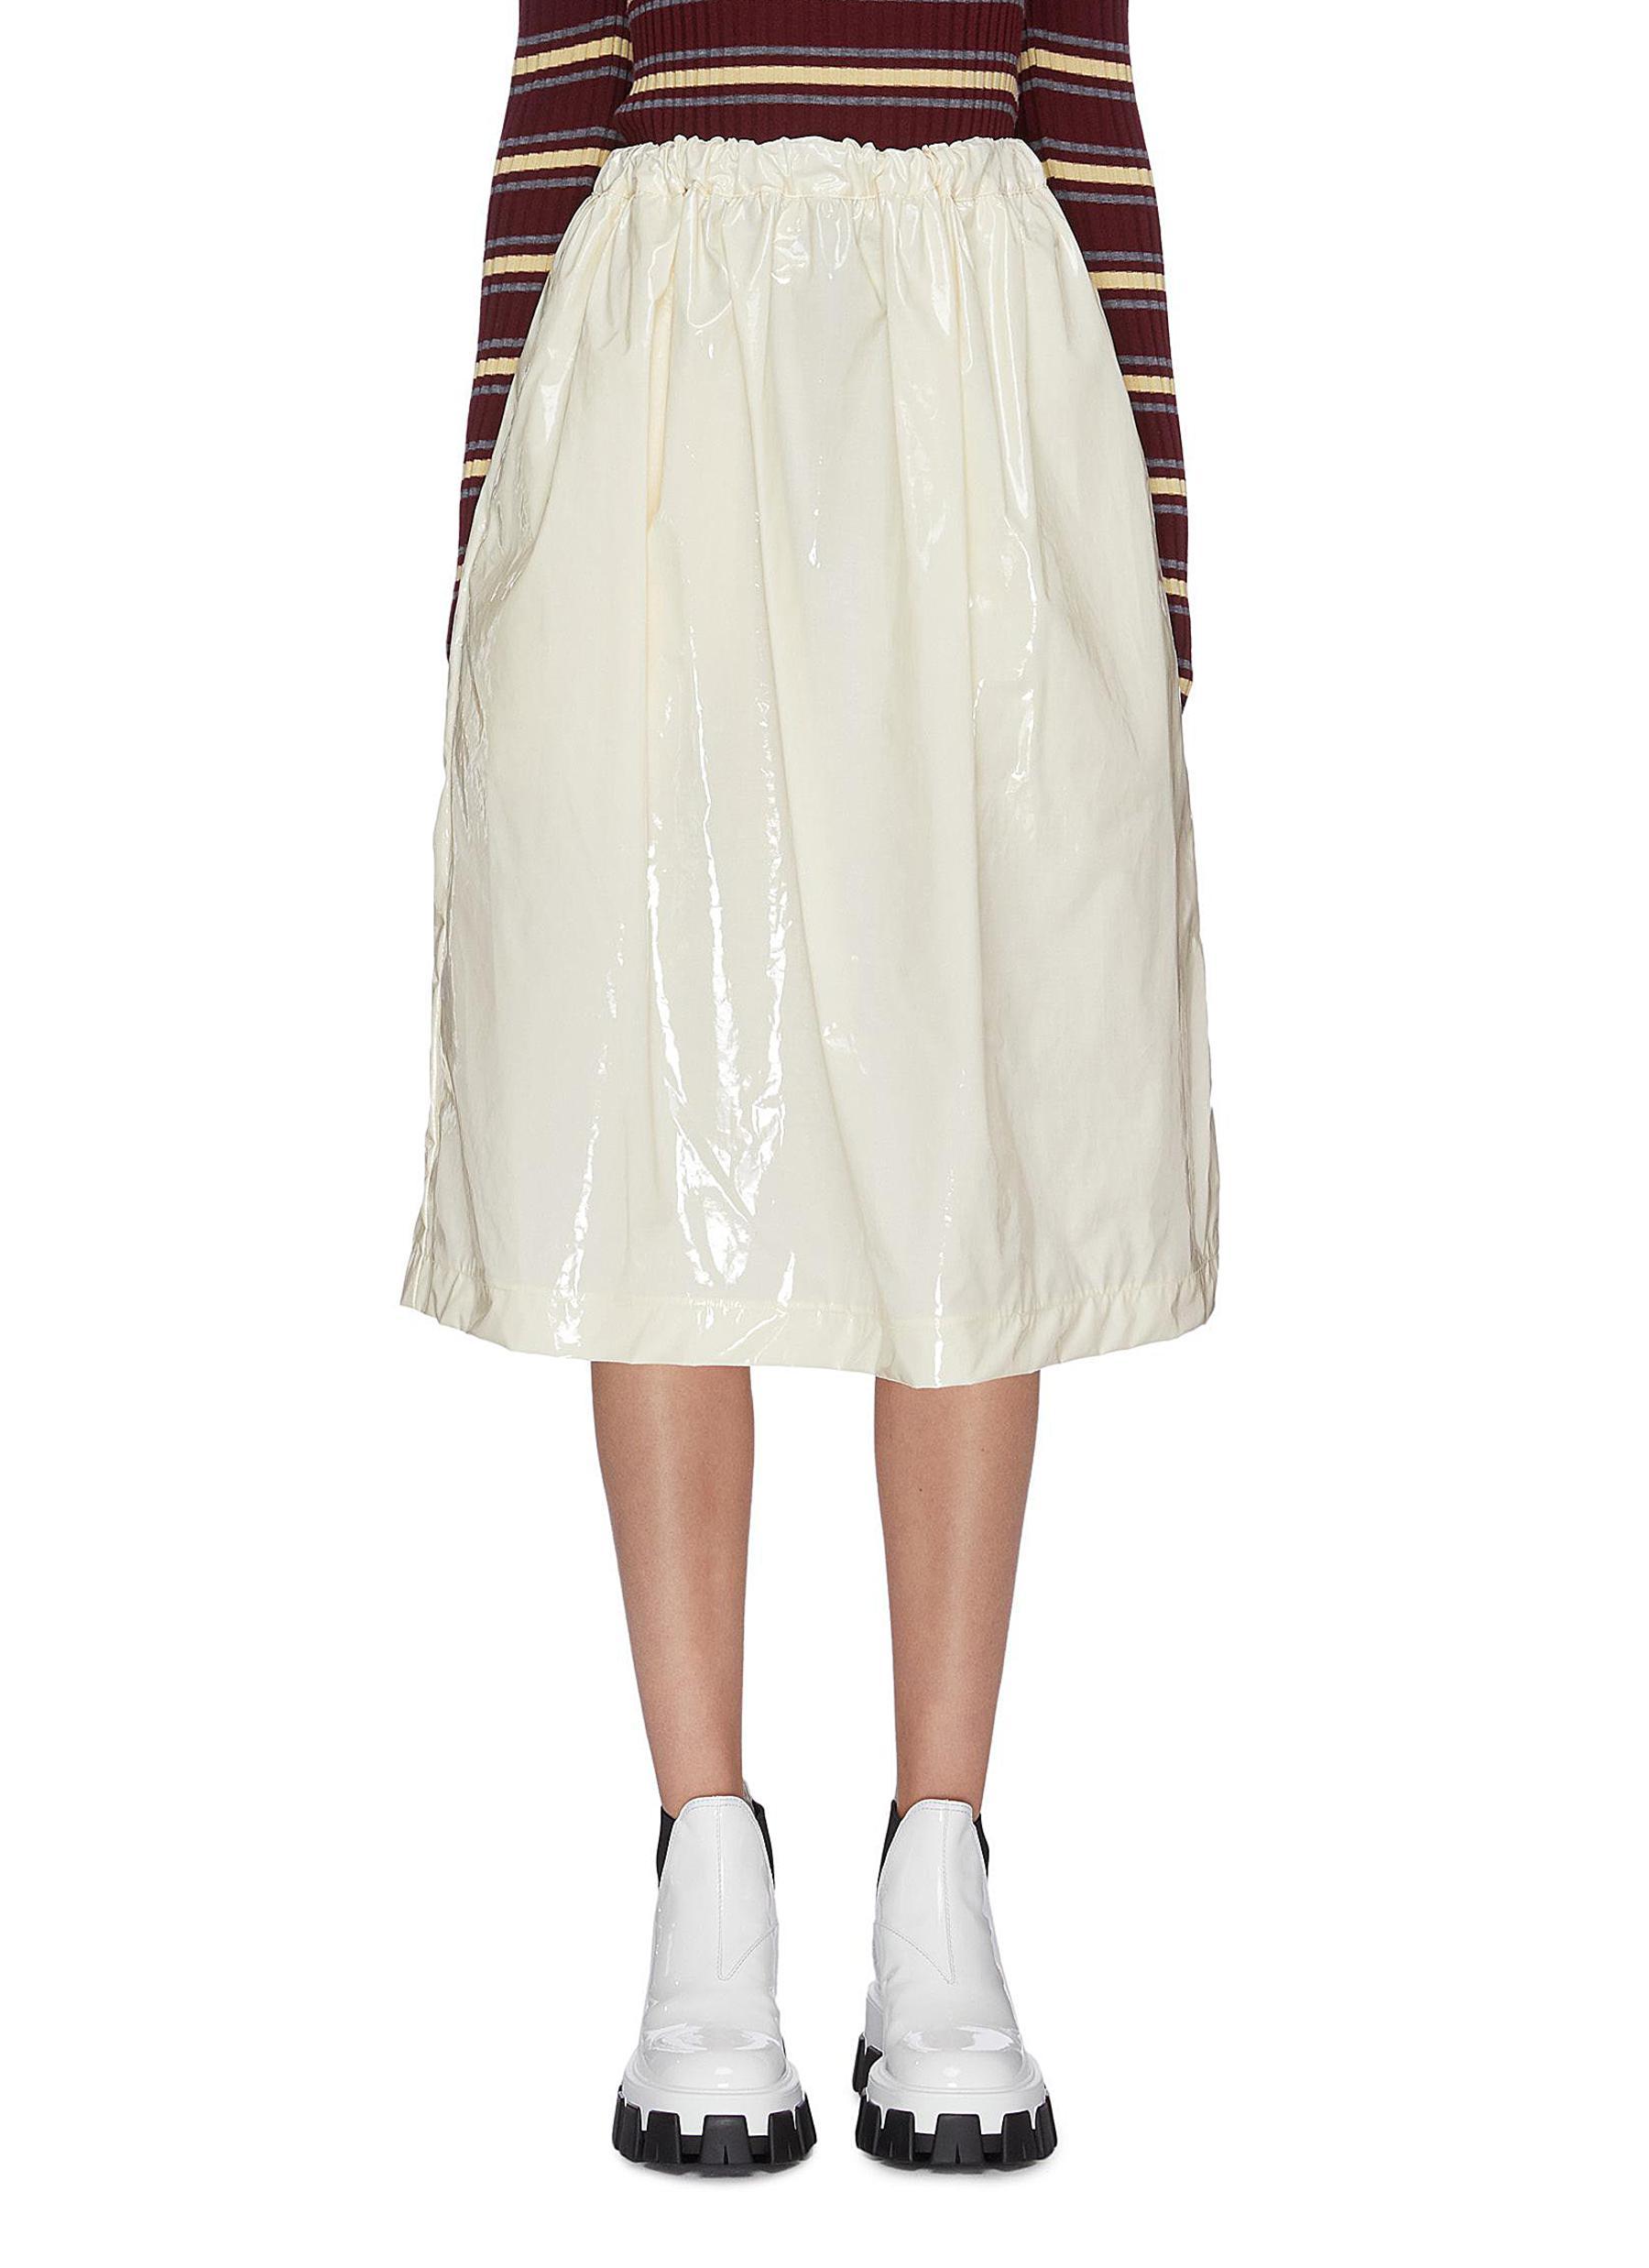 Gathered vinyl skirt by Plan C